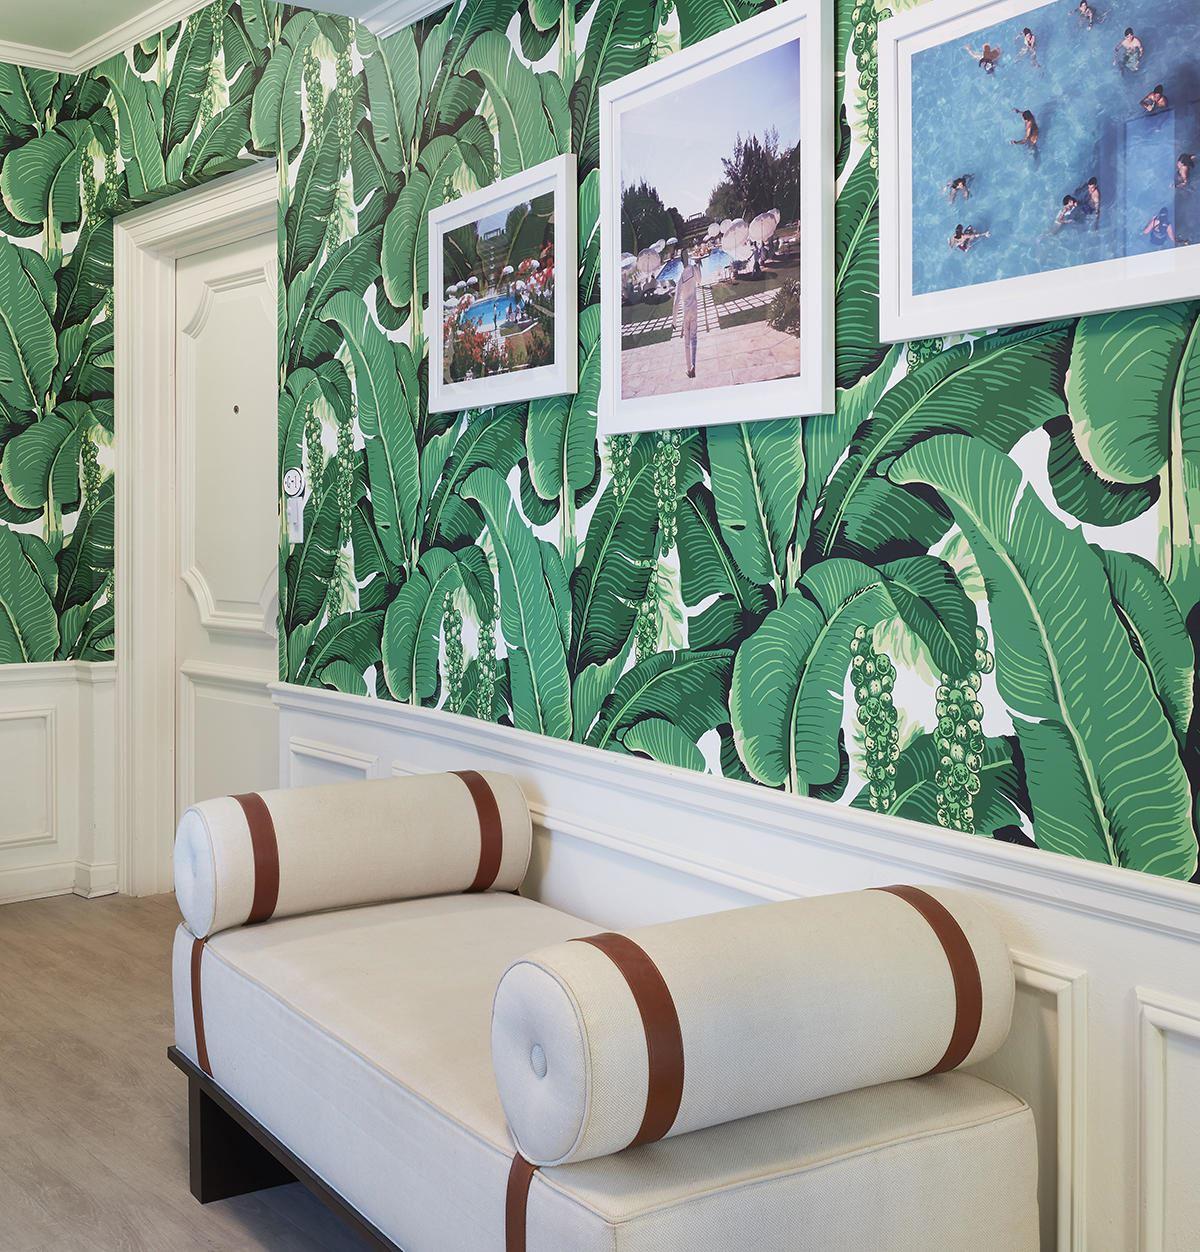 100 Royal Palm Way #G1, Palm Beach, FL 33480 - #: RX-10623040